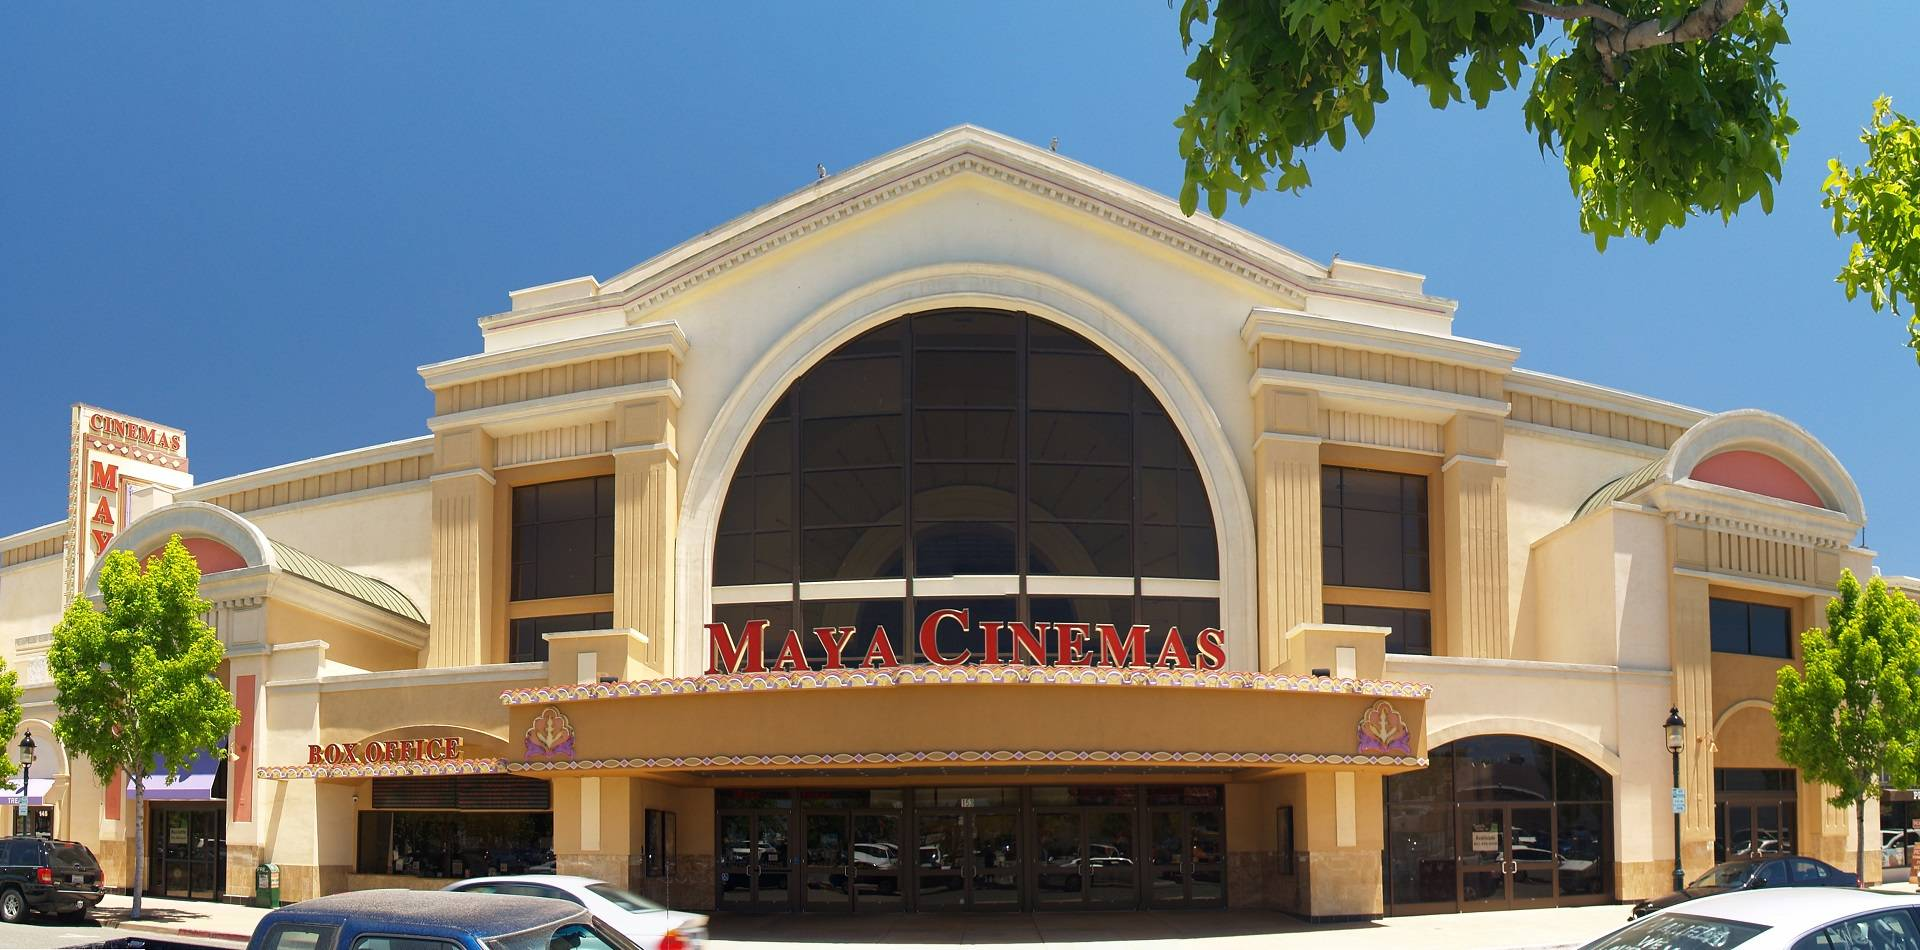 The Maya Cinemas in Salinas. Stephen Gough/Flickr